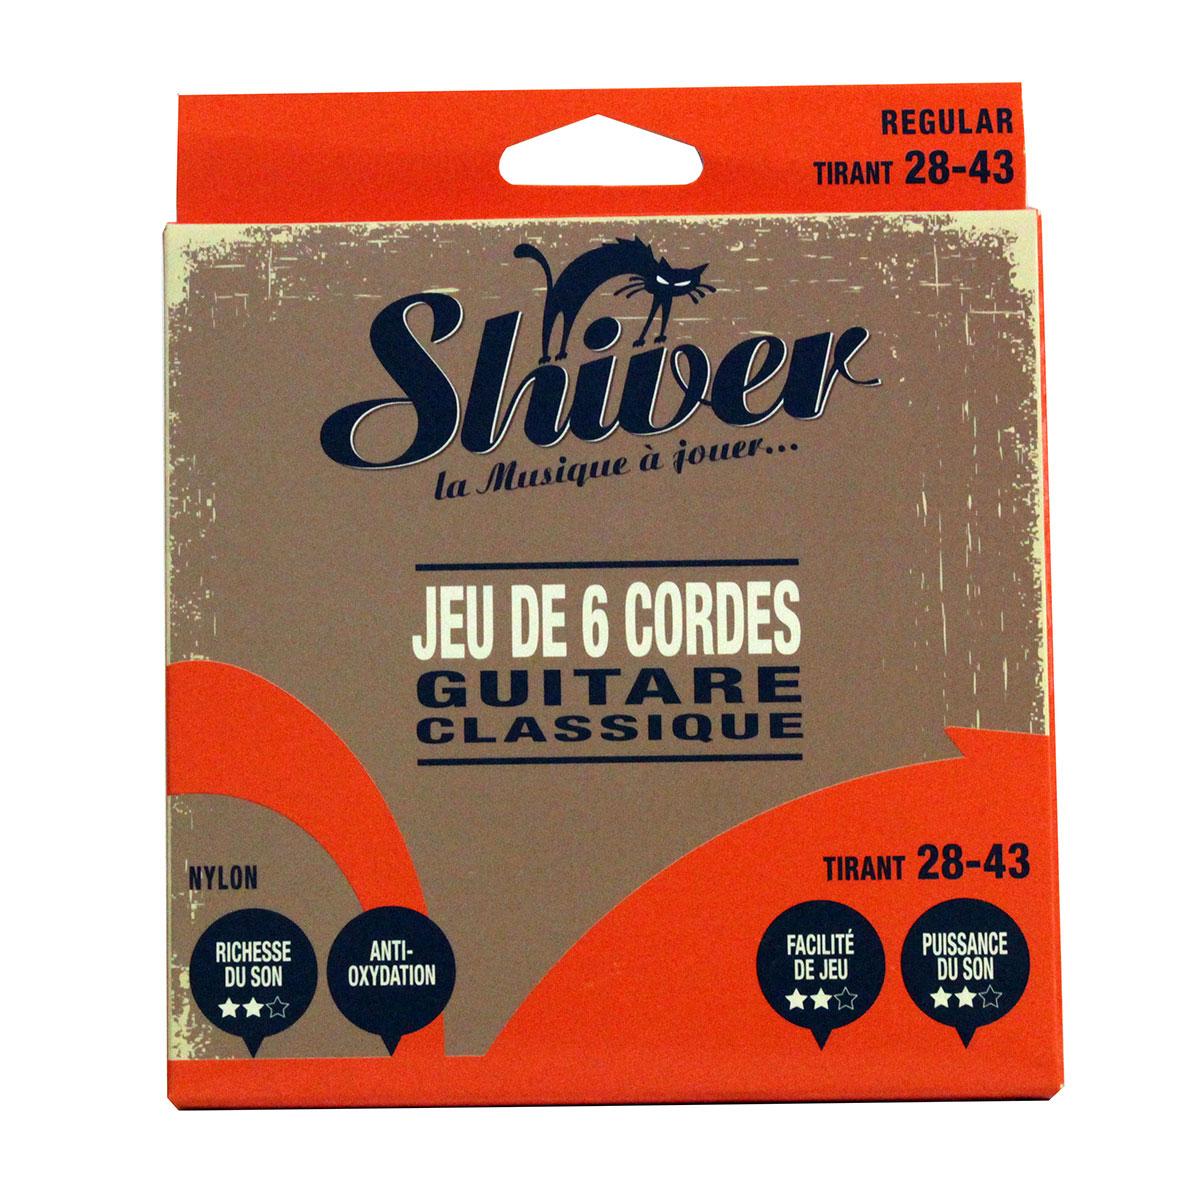 Shiver - Jeu 6 cordes guitare classique 28-43 deluxe